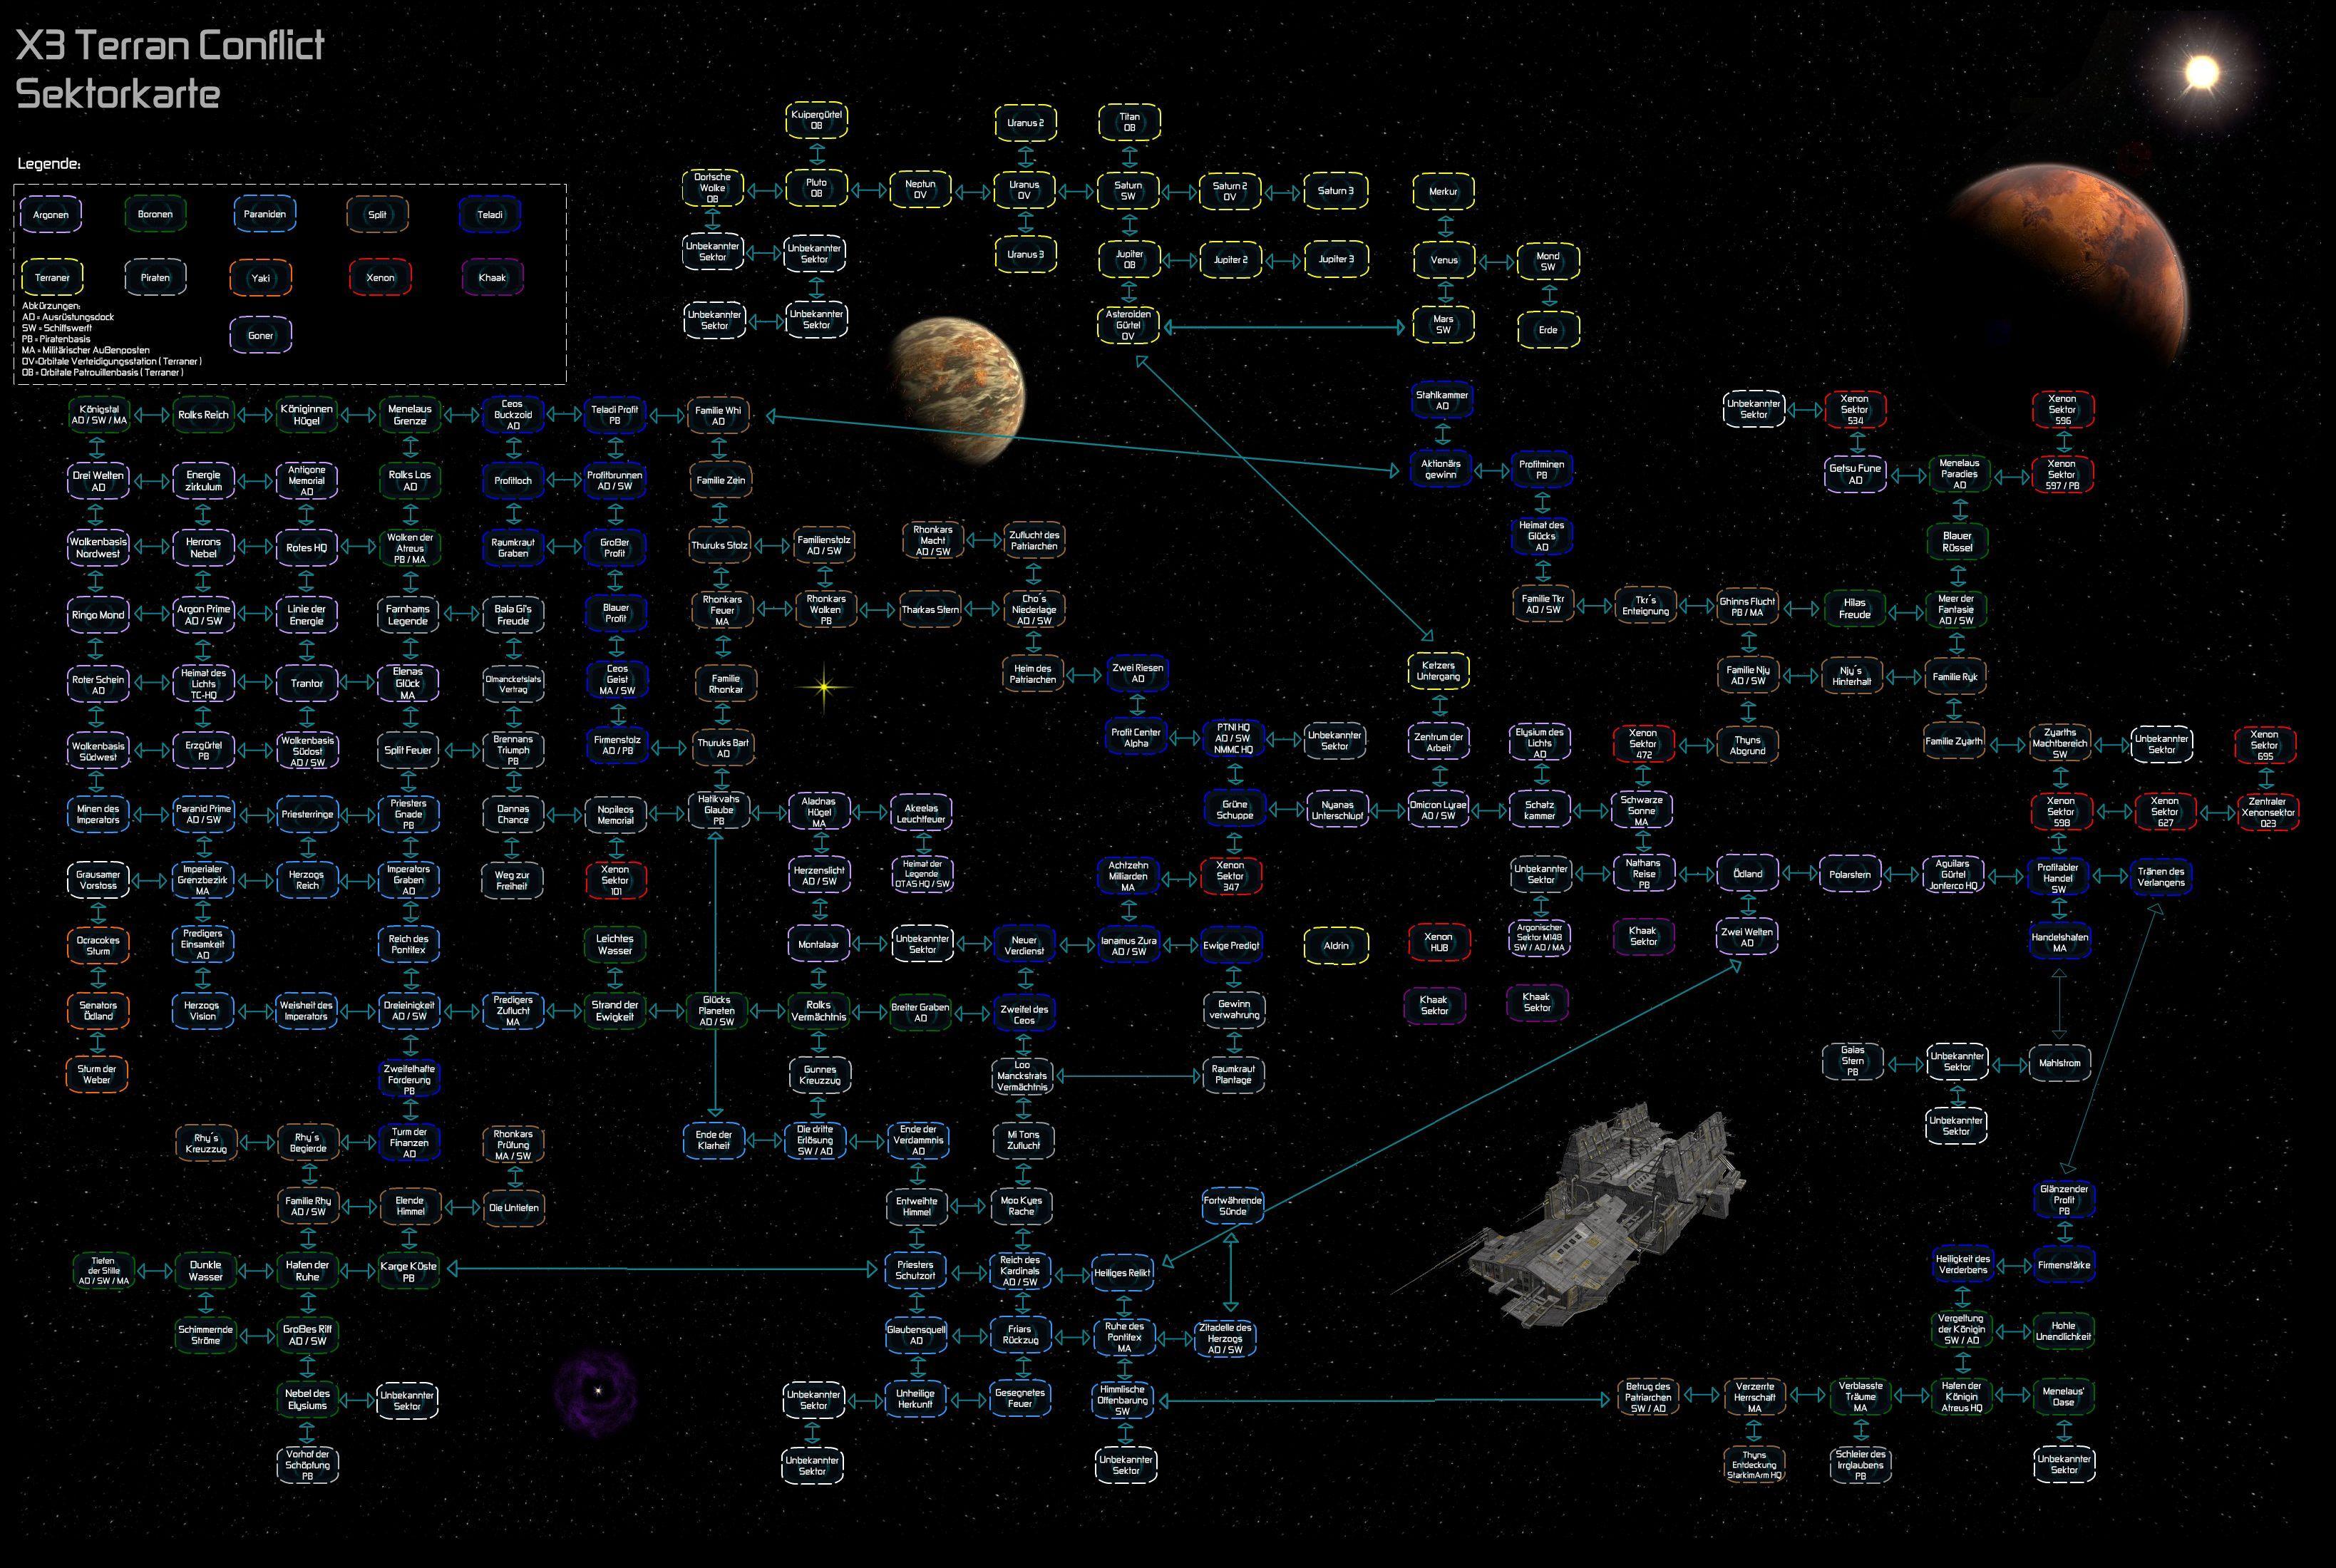 X3 Karte